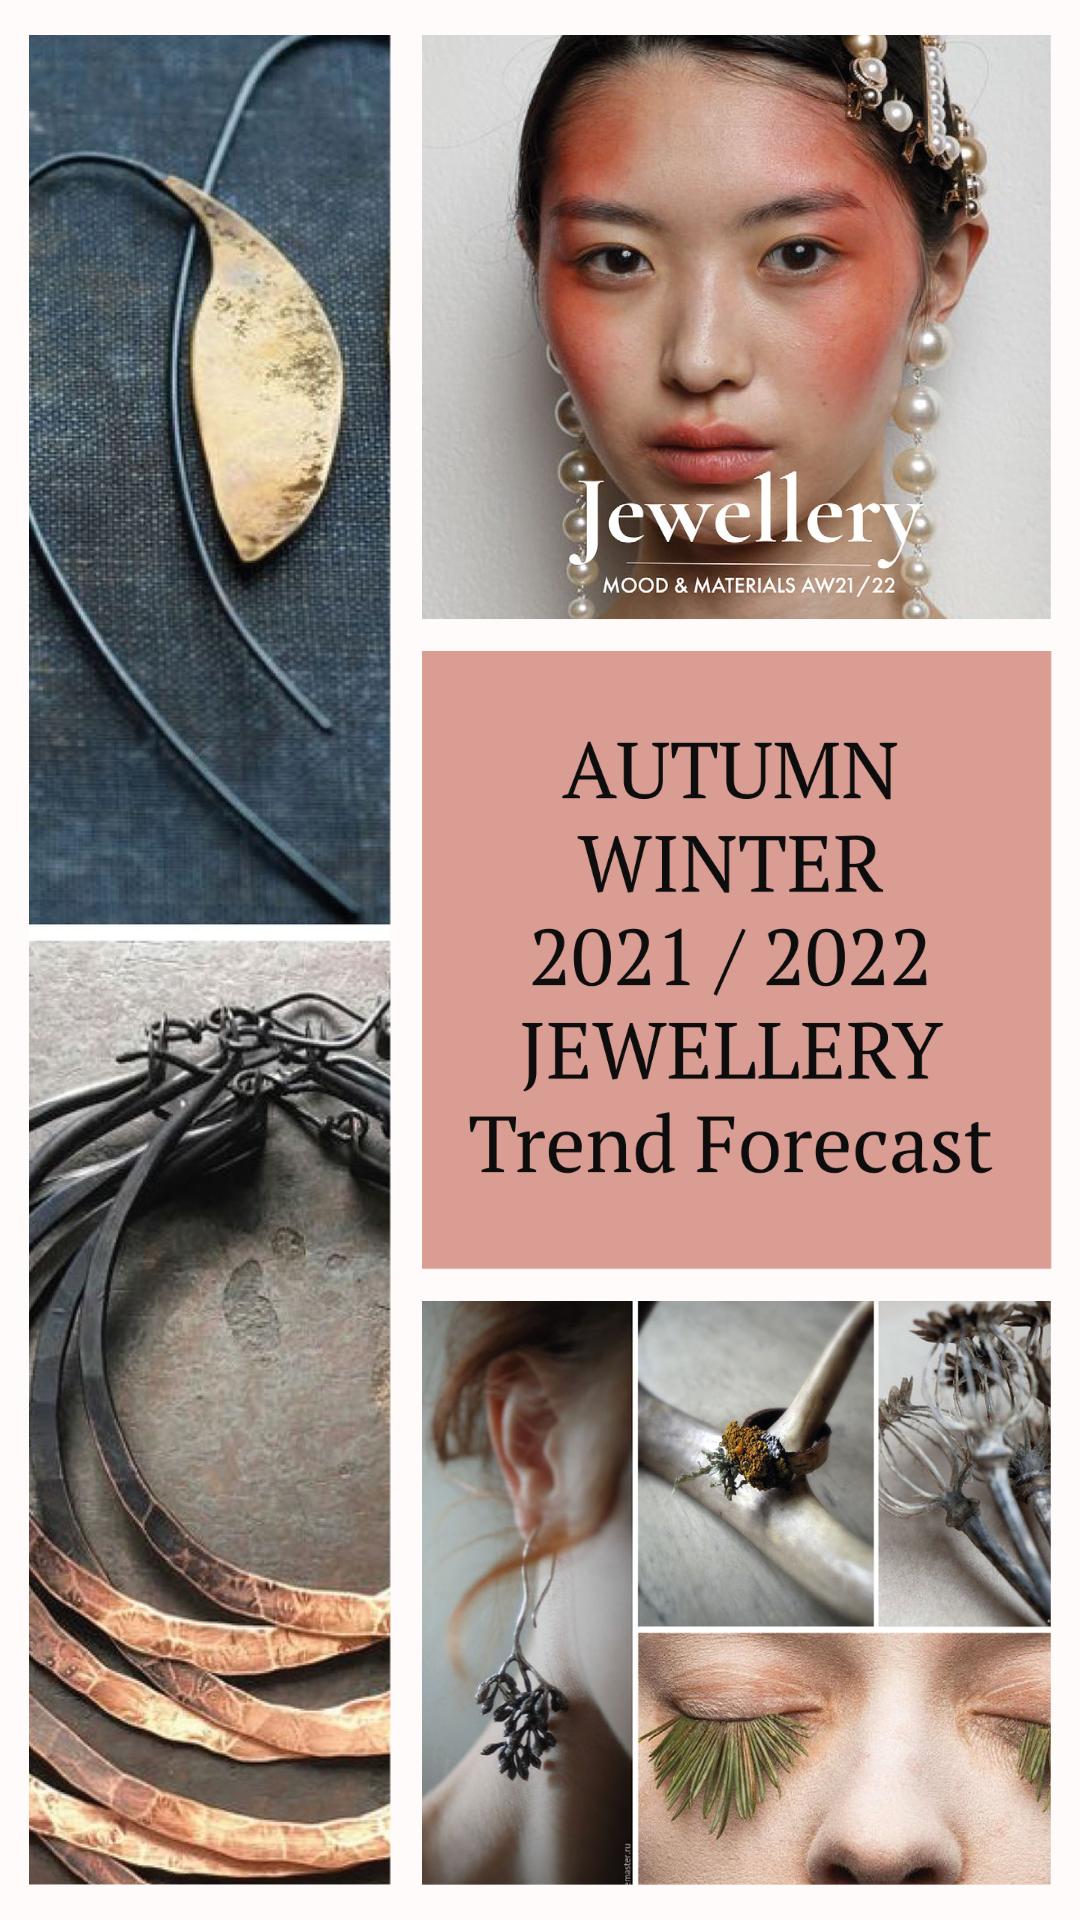 Women's Jewellery Trends Autumn Winter 2021/22 | Jewelry ...